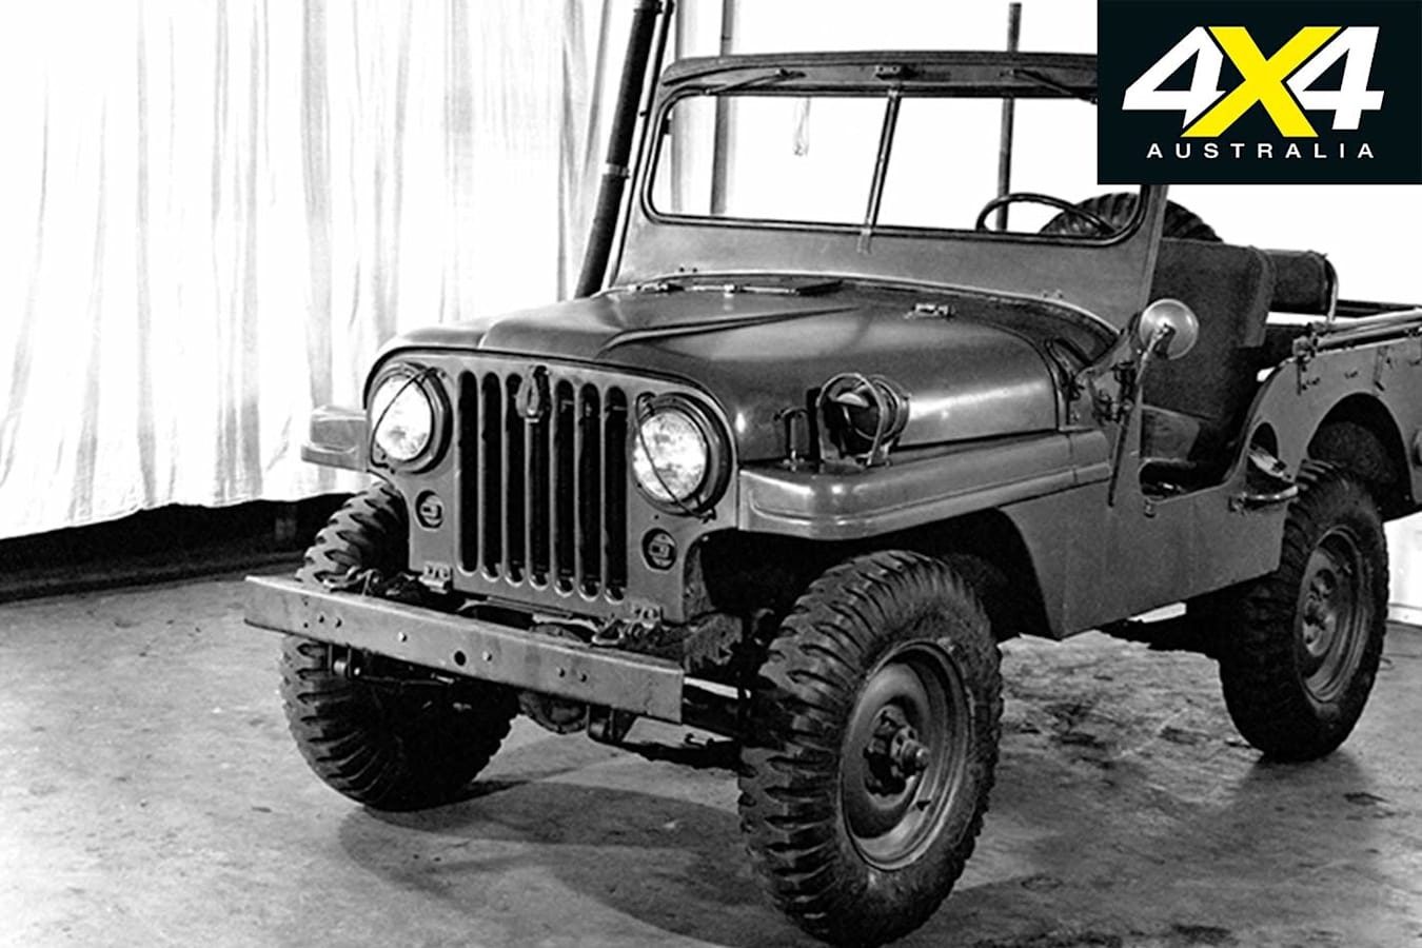 CJ Willys Overland Jeep Jpg